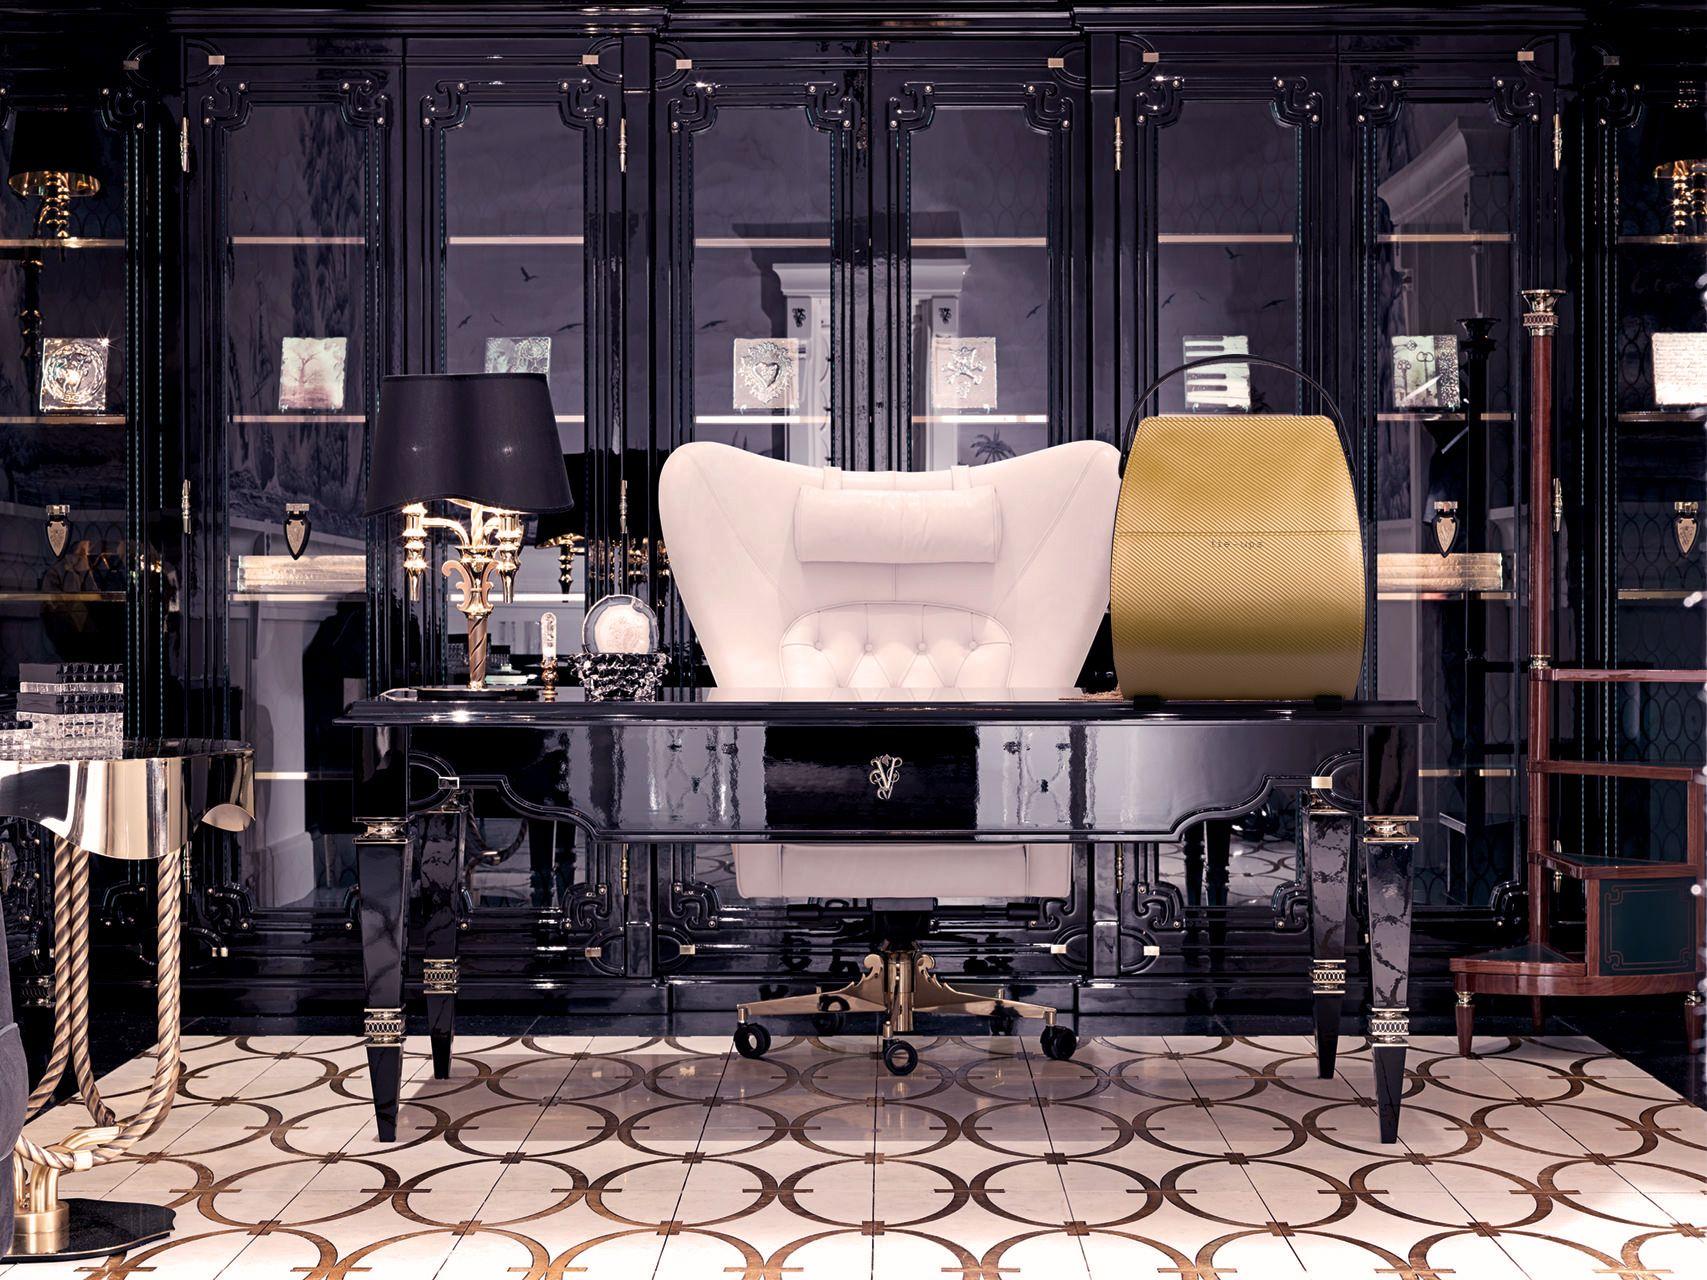 Interior design tieupsstyle architecture goccia bag 명품샵